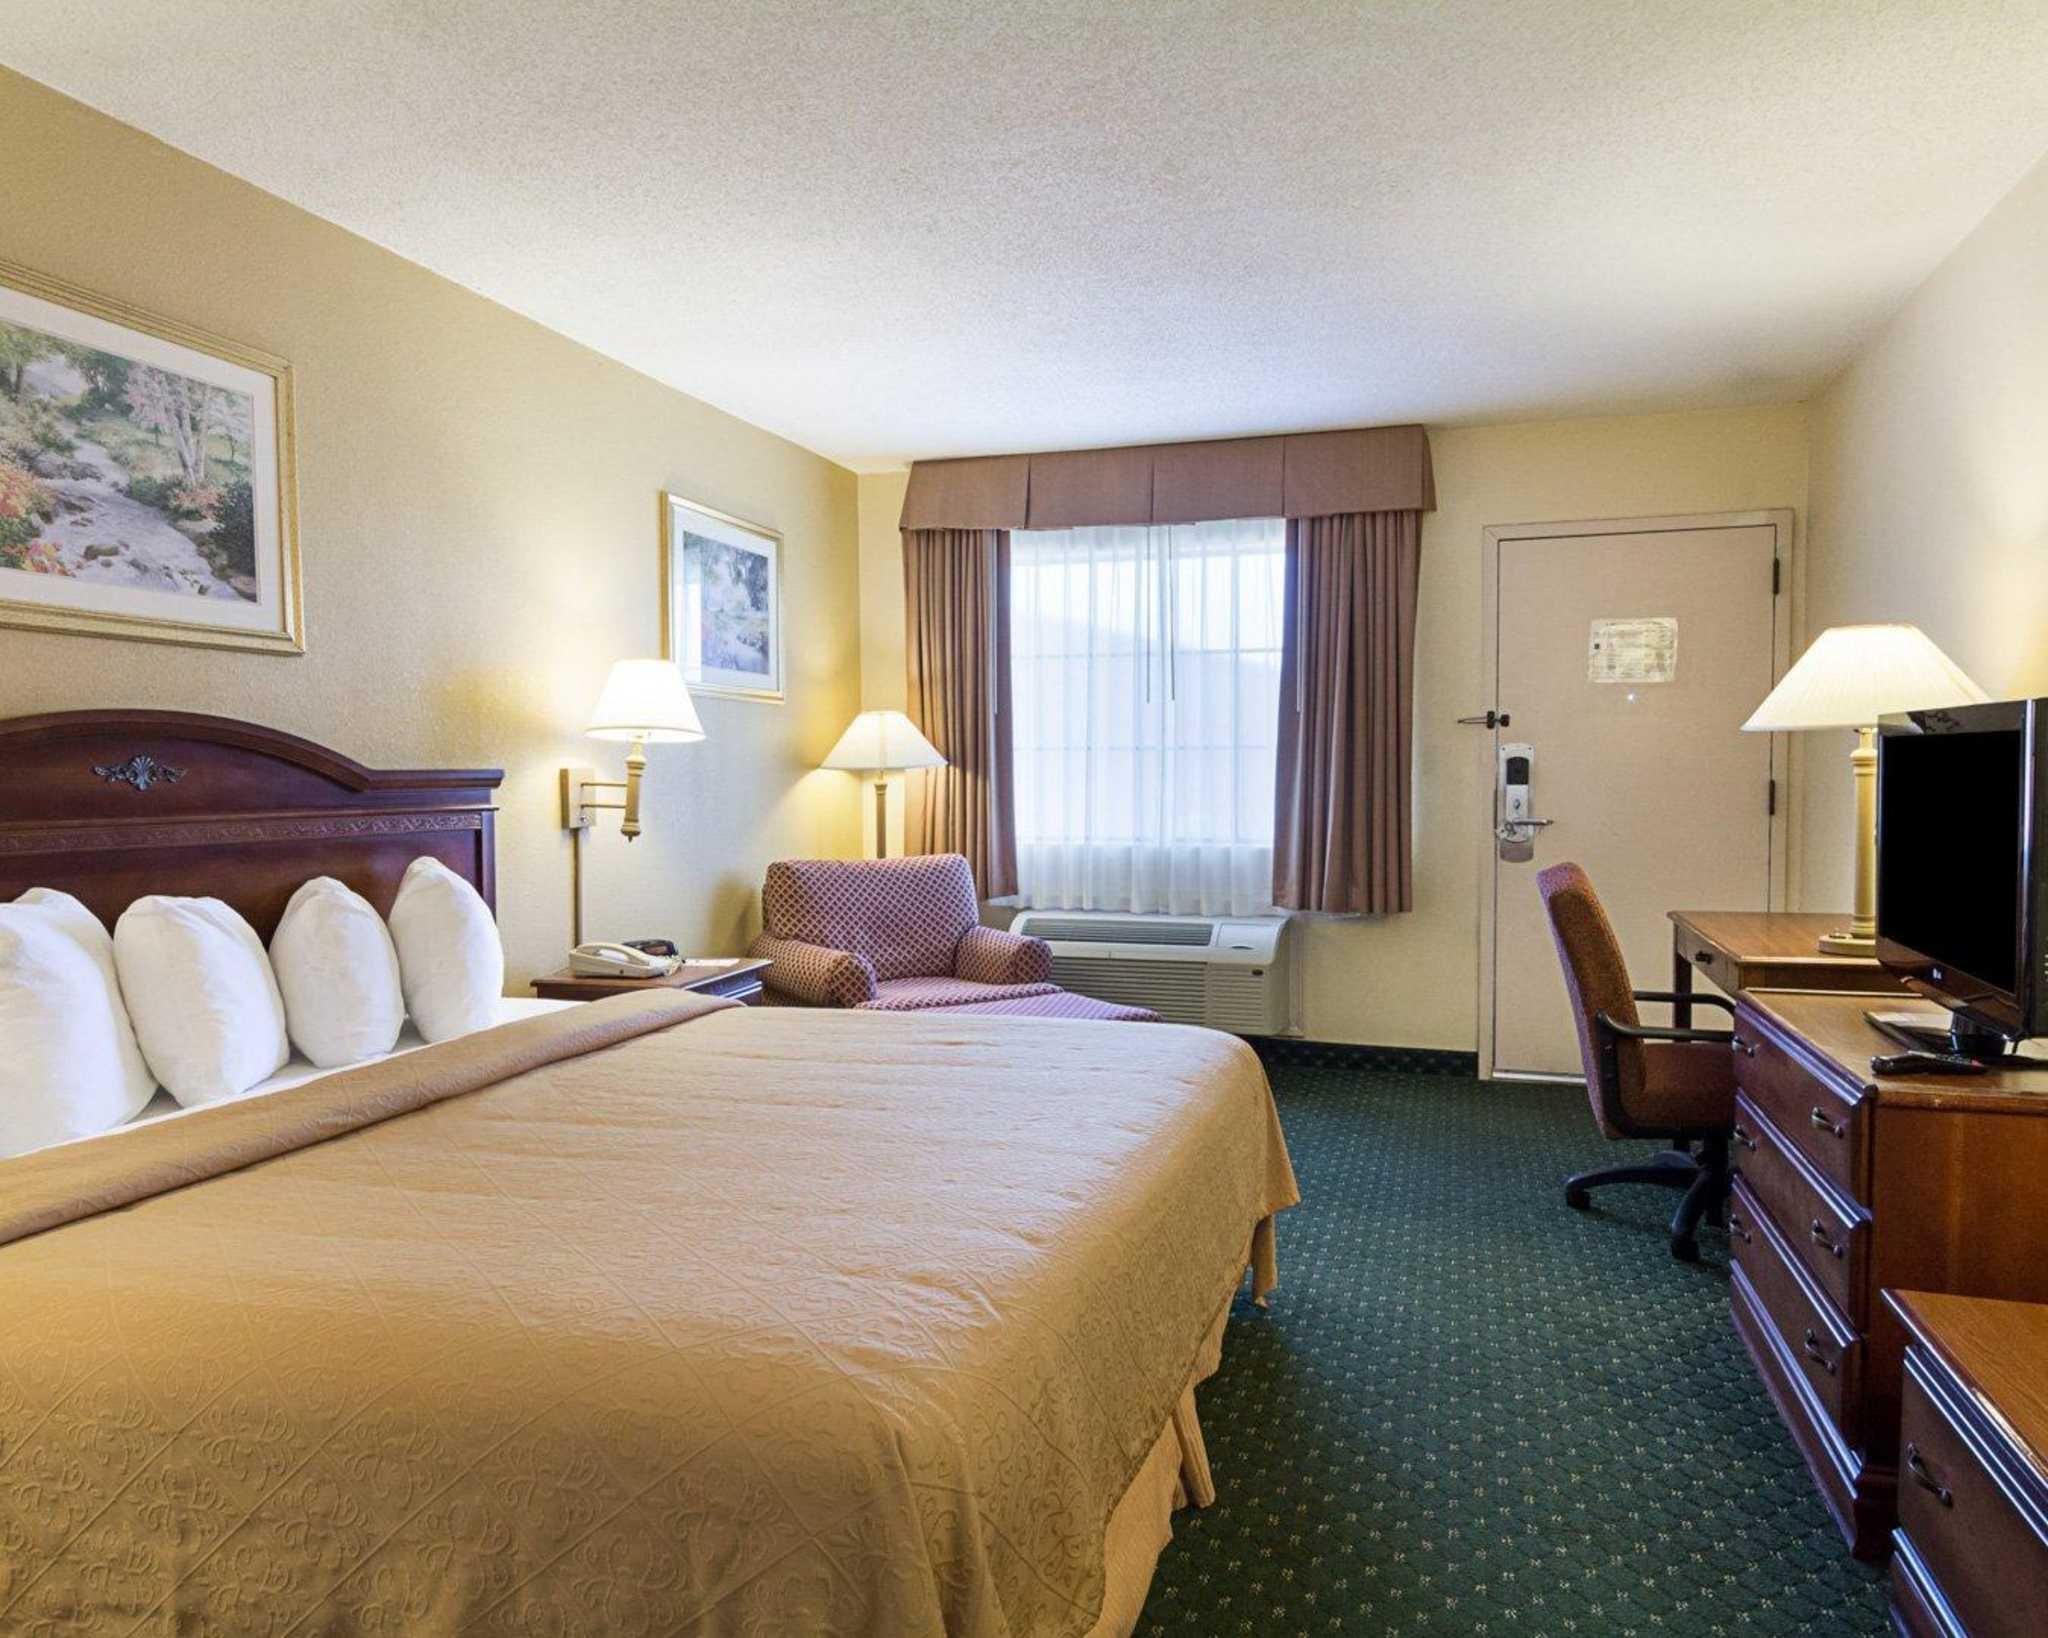 Quality Inn & Suites Southwest image 9